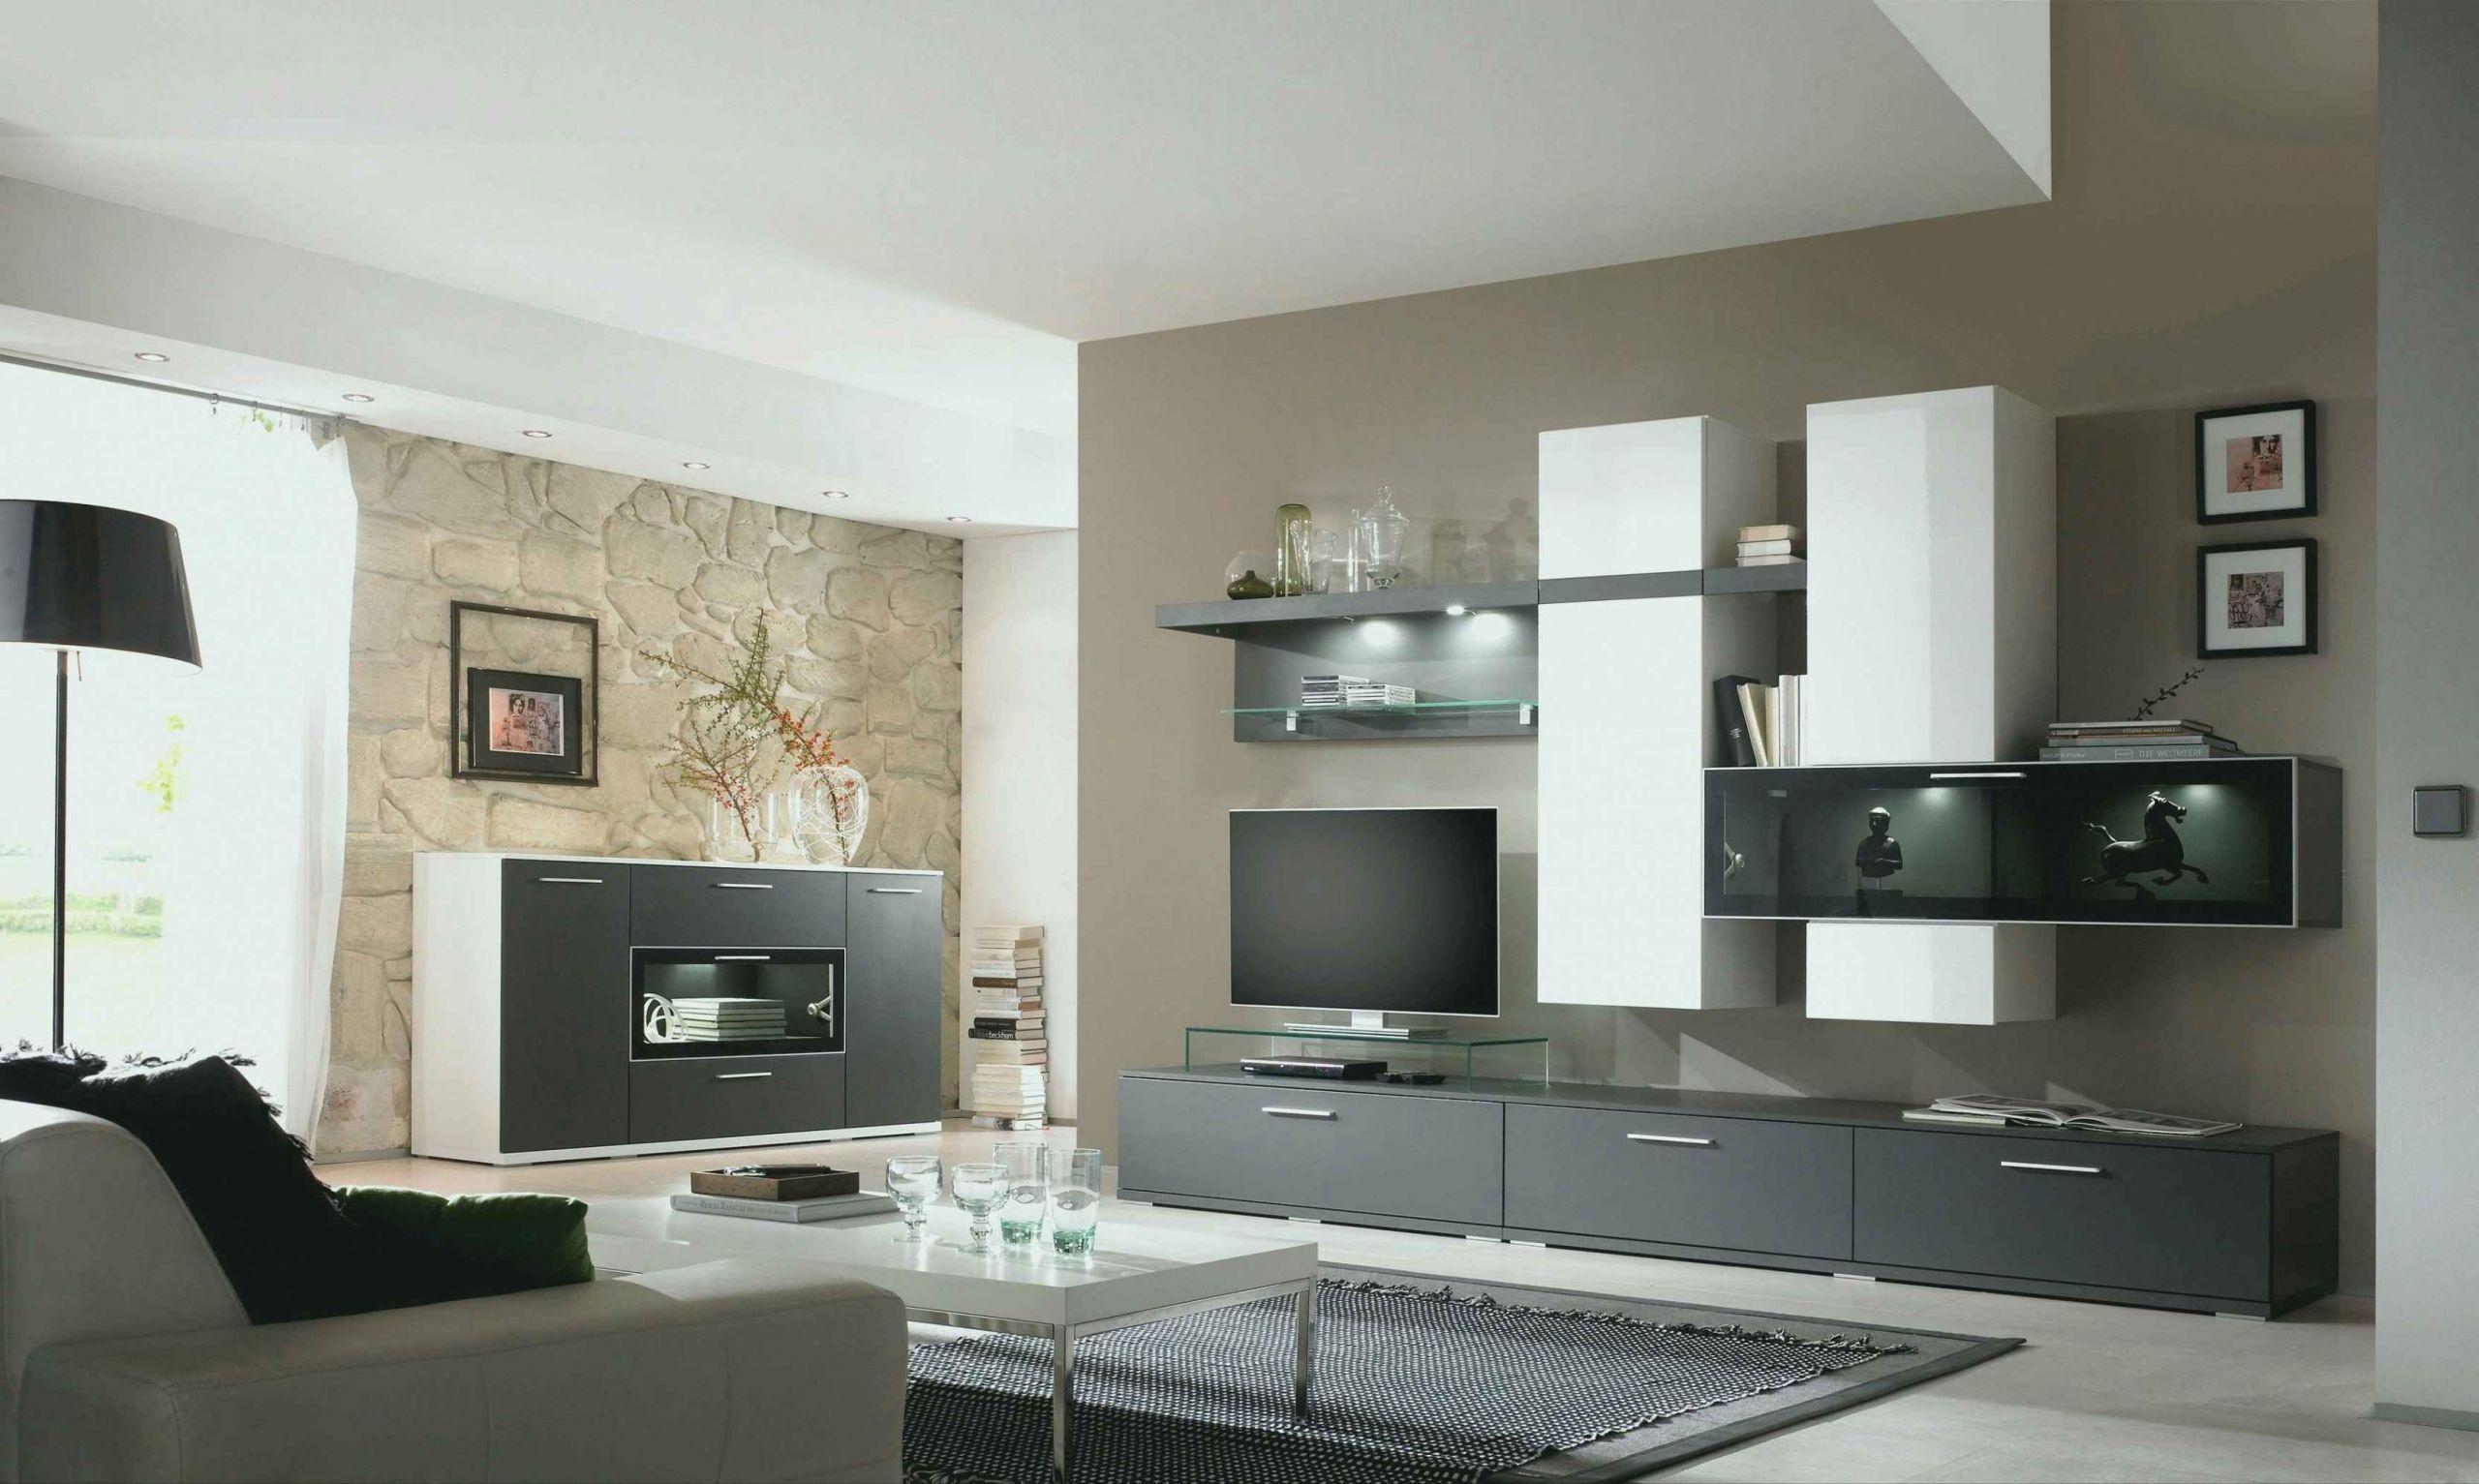 Wandfarbe Wohnzimmer Grau Weiß